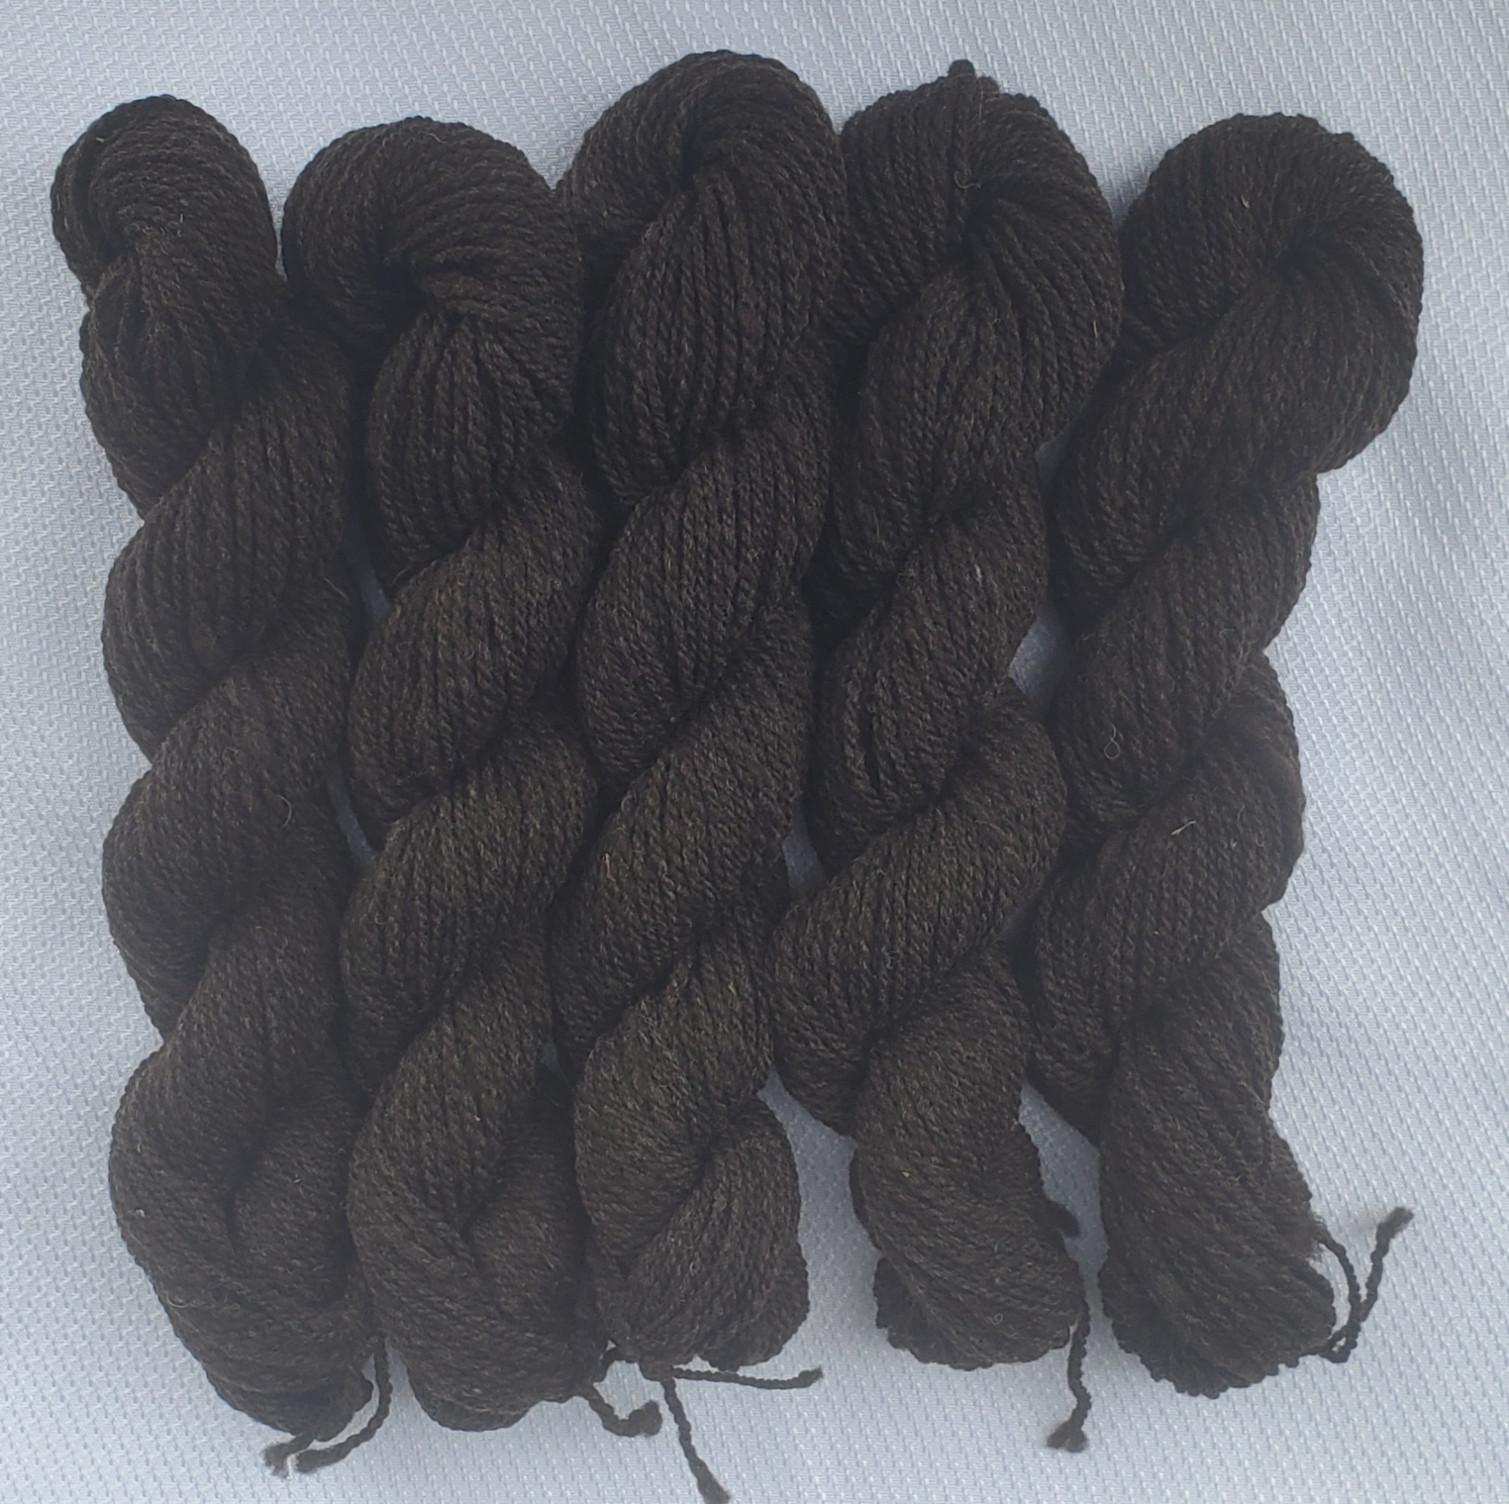 Naturally Colored Yarn - lot 21-6